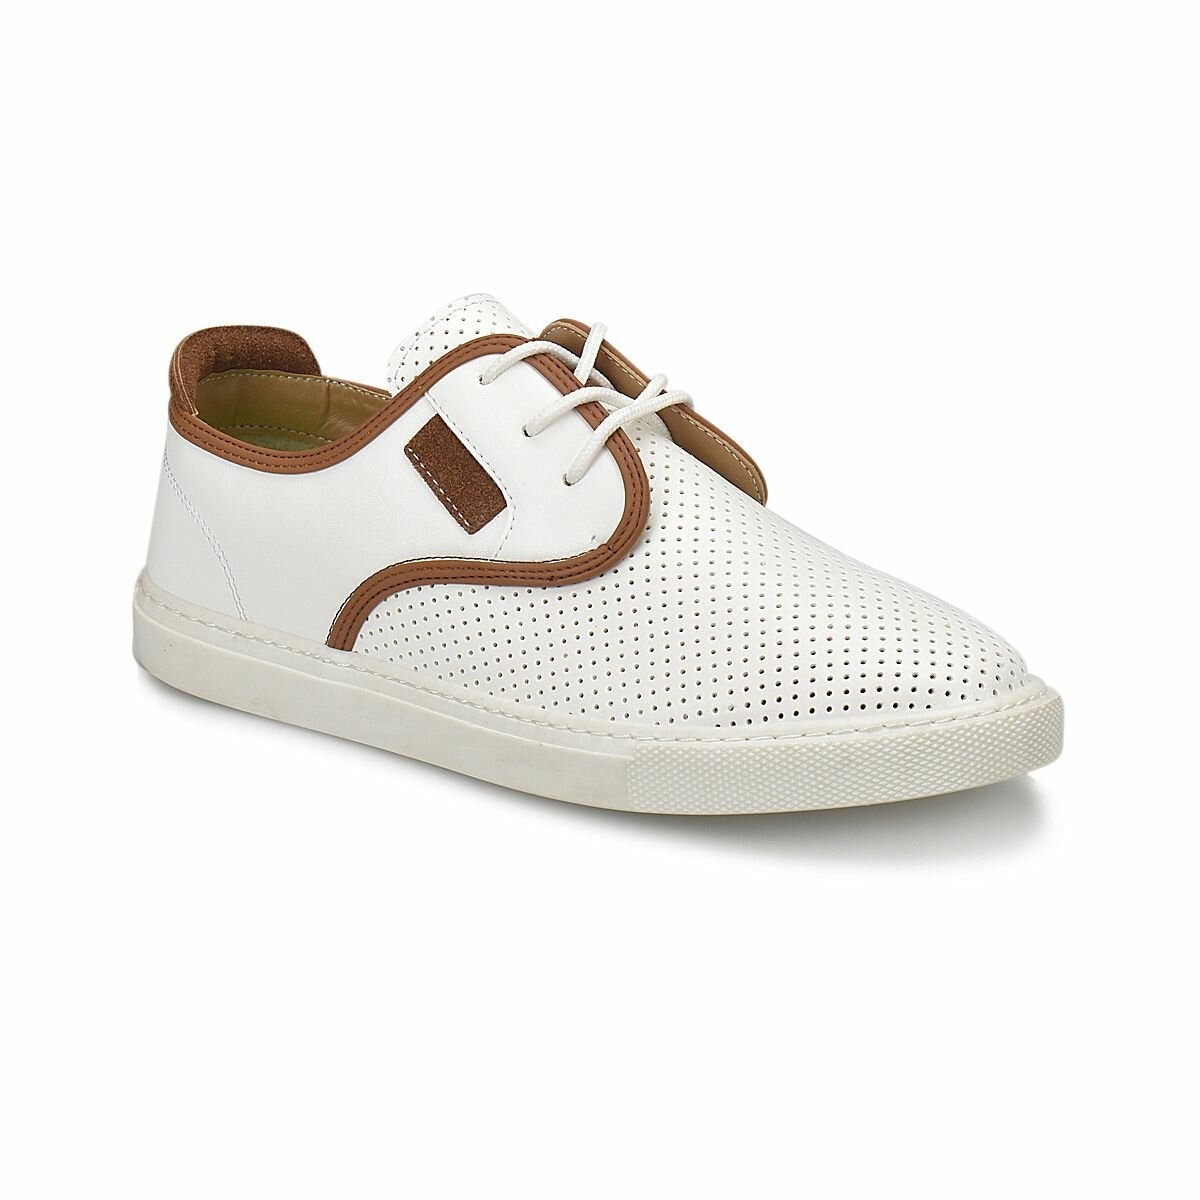 FLO PNM312.G White Male Child Sneaker Shoes Panama Club